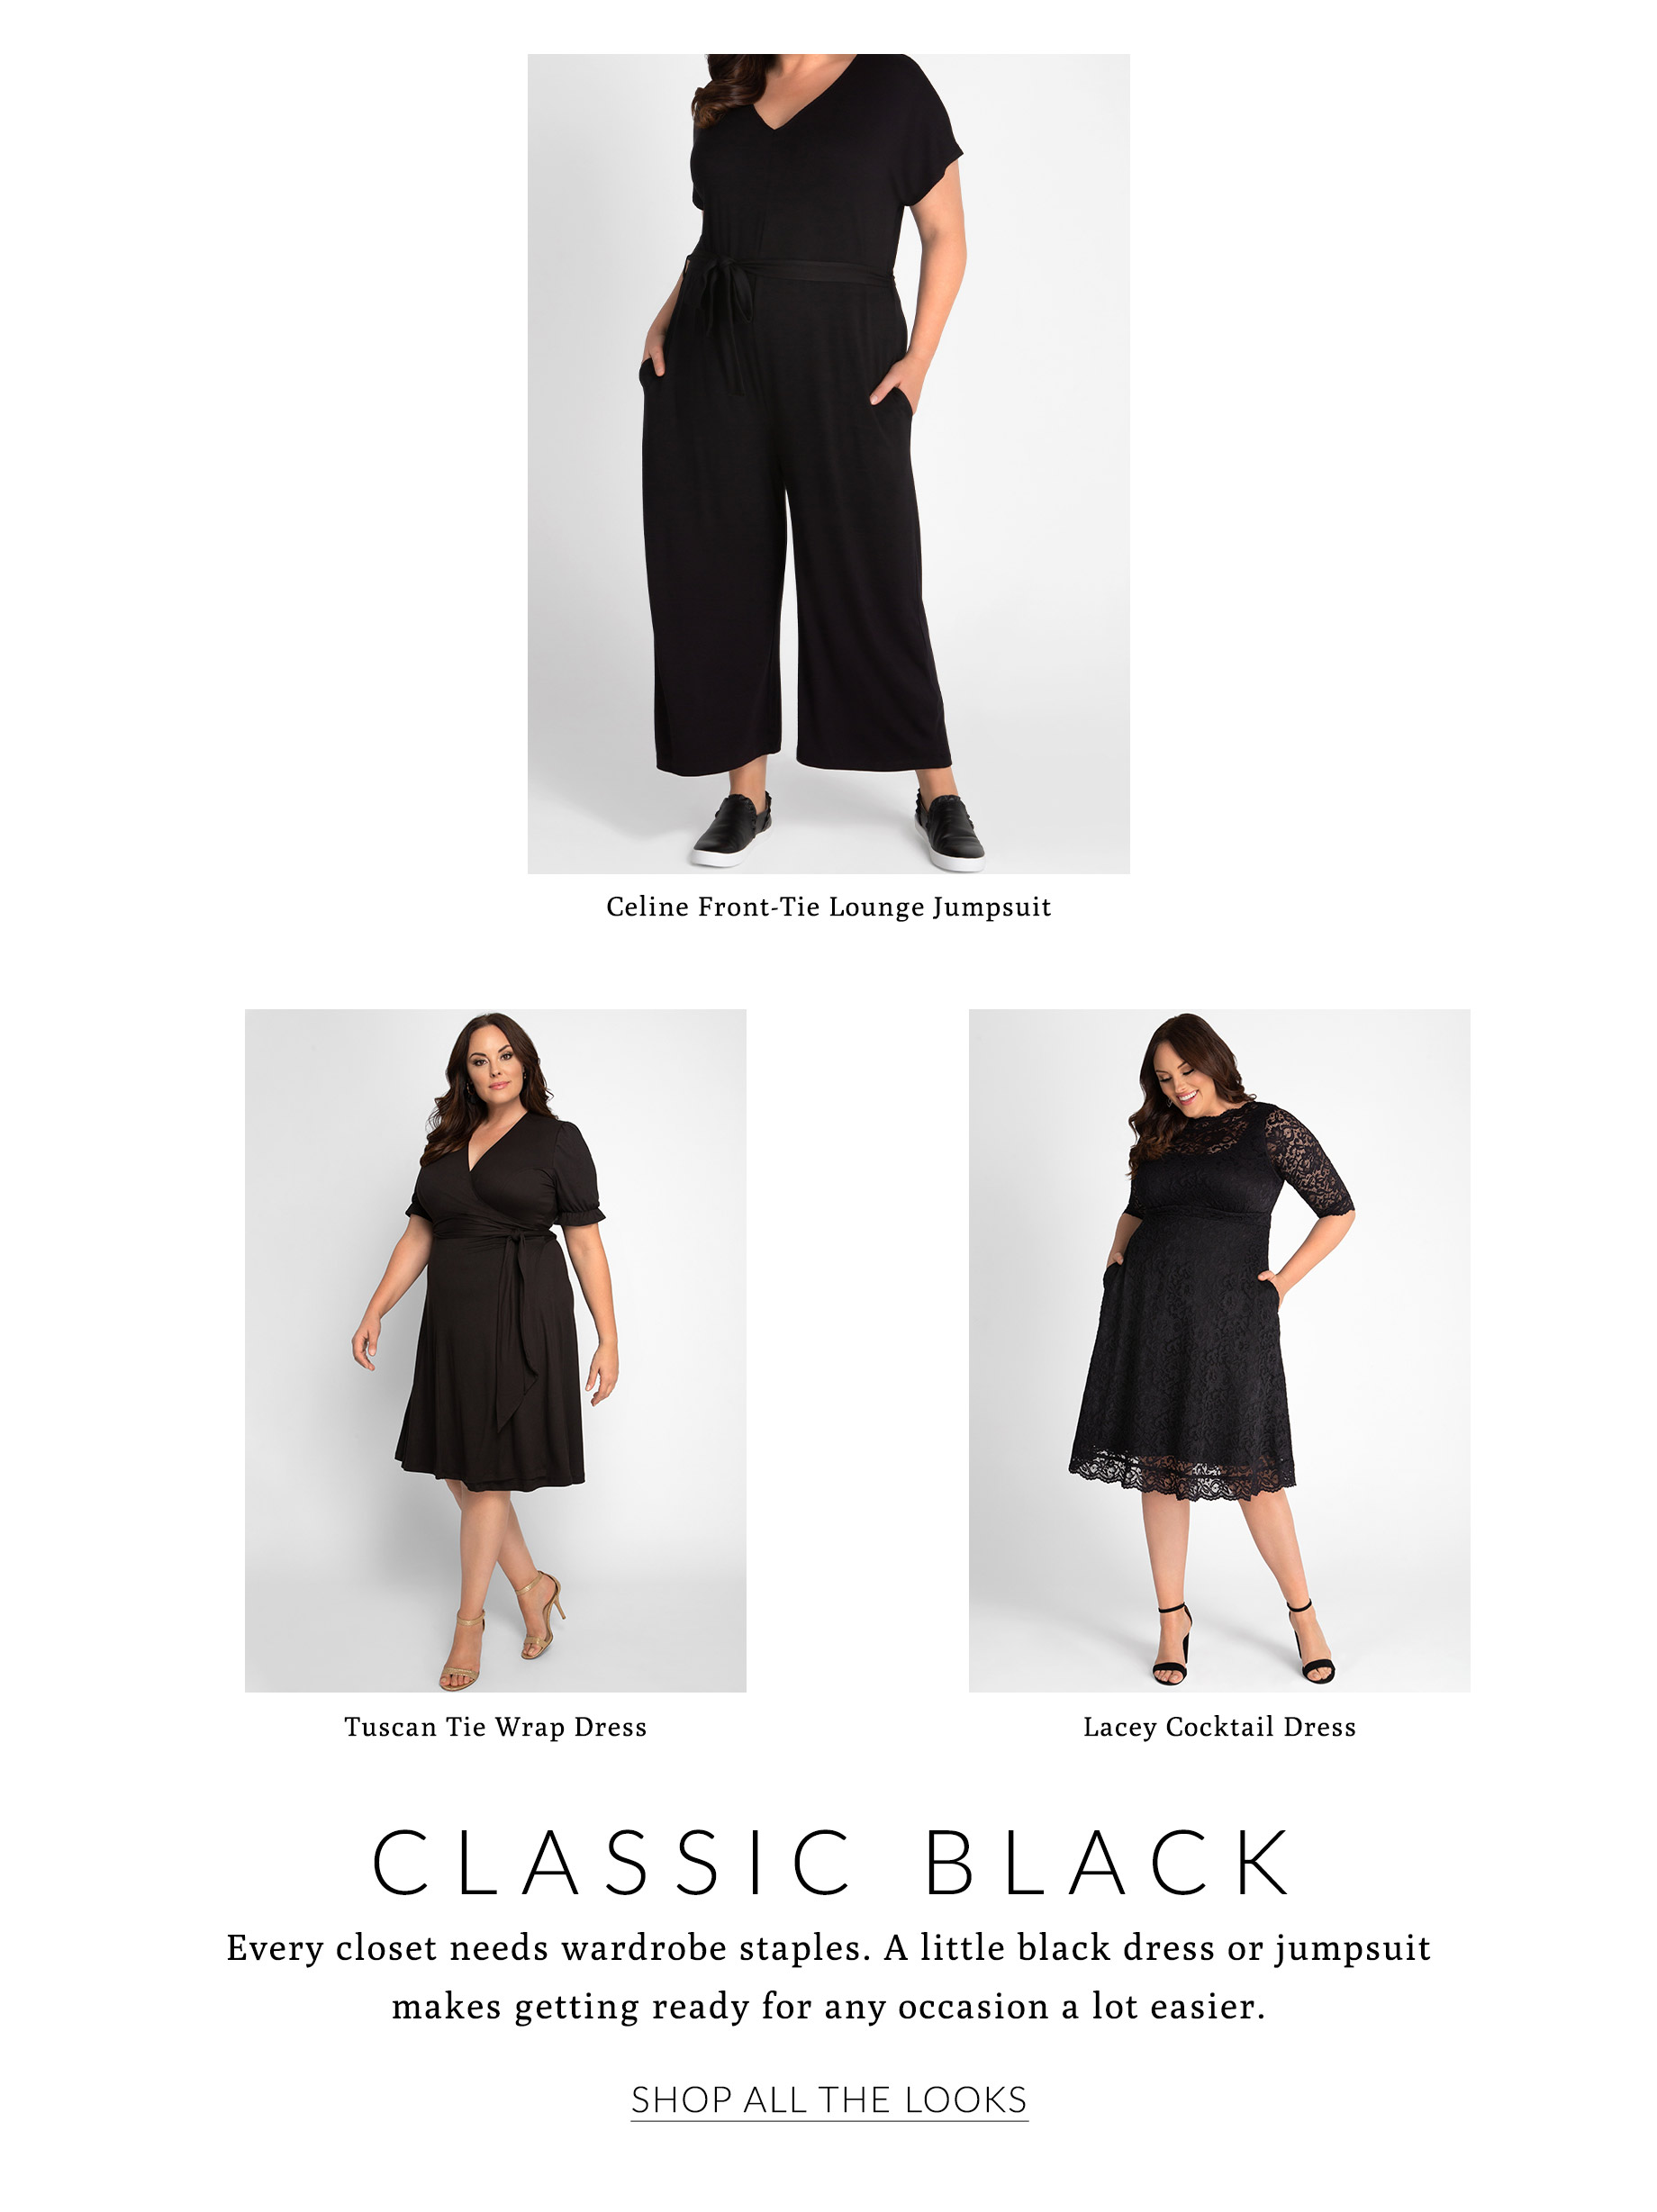 Classic Black Styles